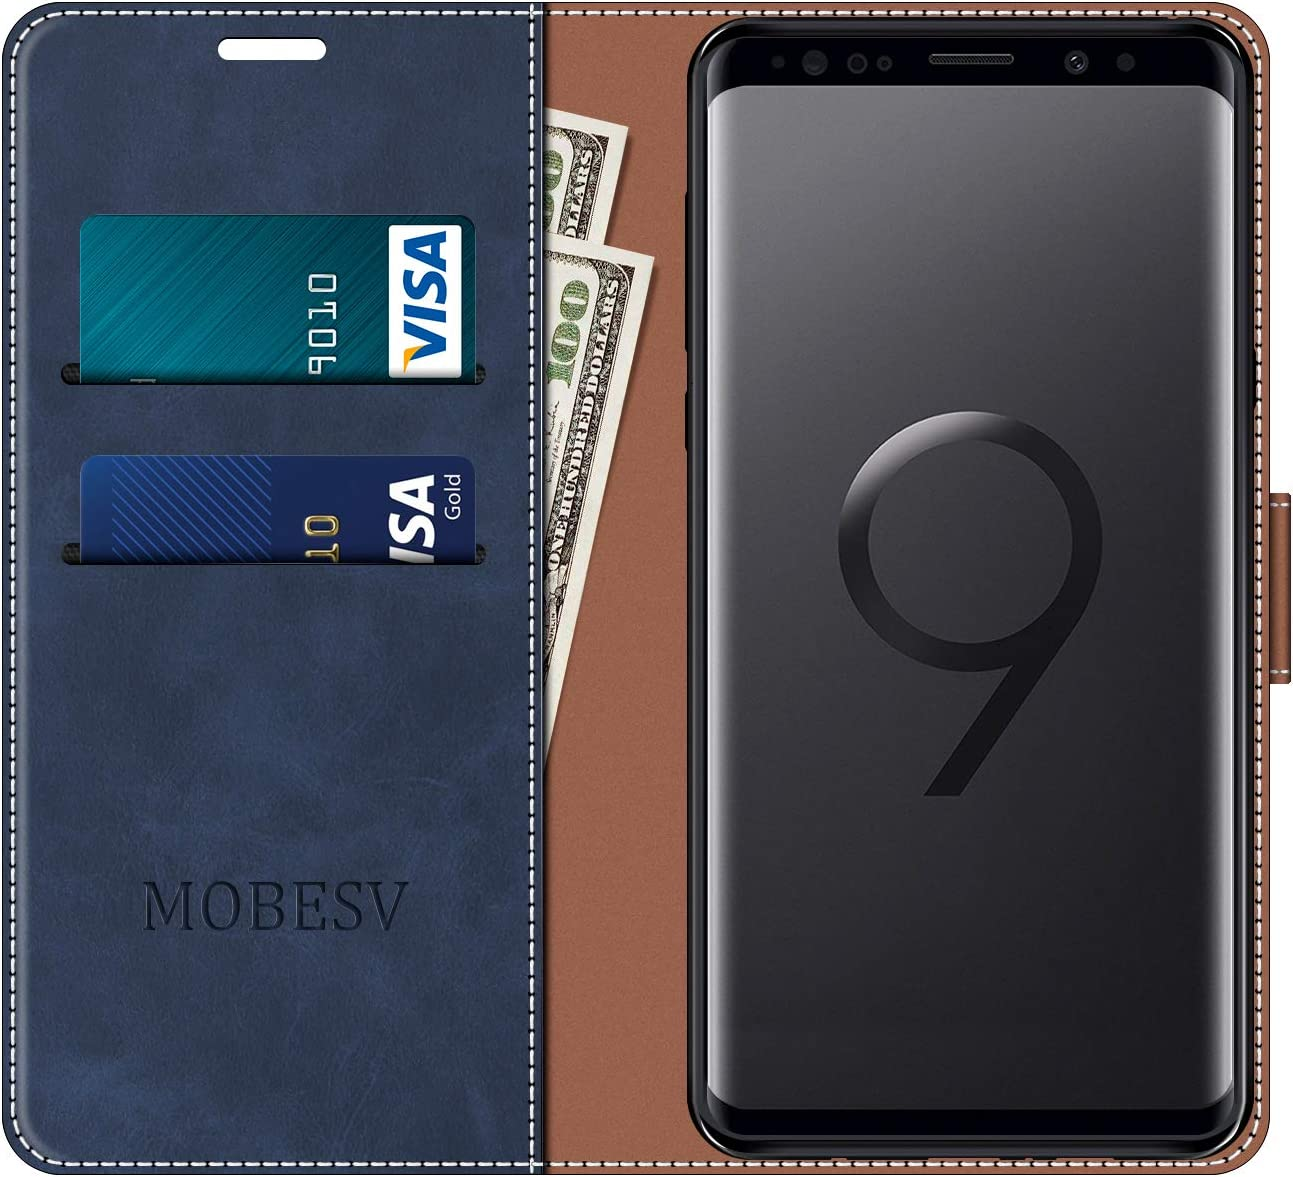 Housse en Cuir Samsung Galaxy S9 /Él/égant Noir /Étui T/él/éphone Samsung Galaxy S9 Magn/étique Etui Housse pour Samsung Galaxy S9 MOBESV Coque pour Samsung Galaxy S9